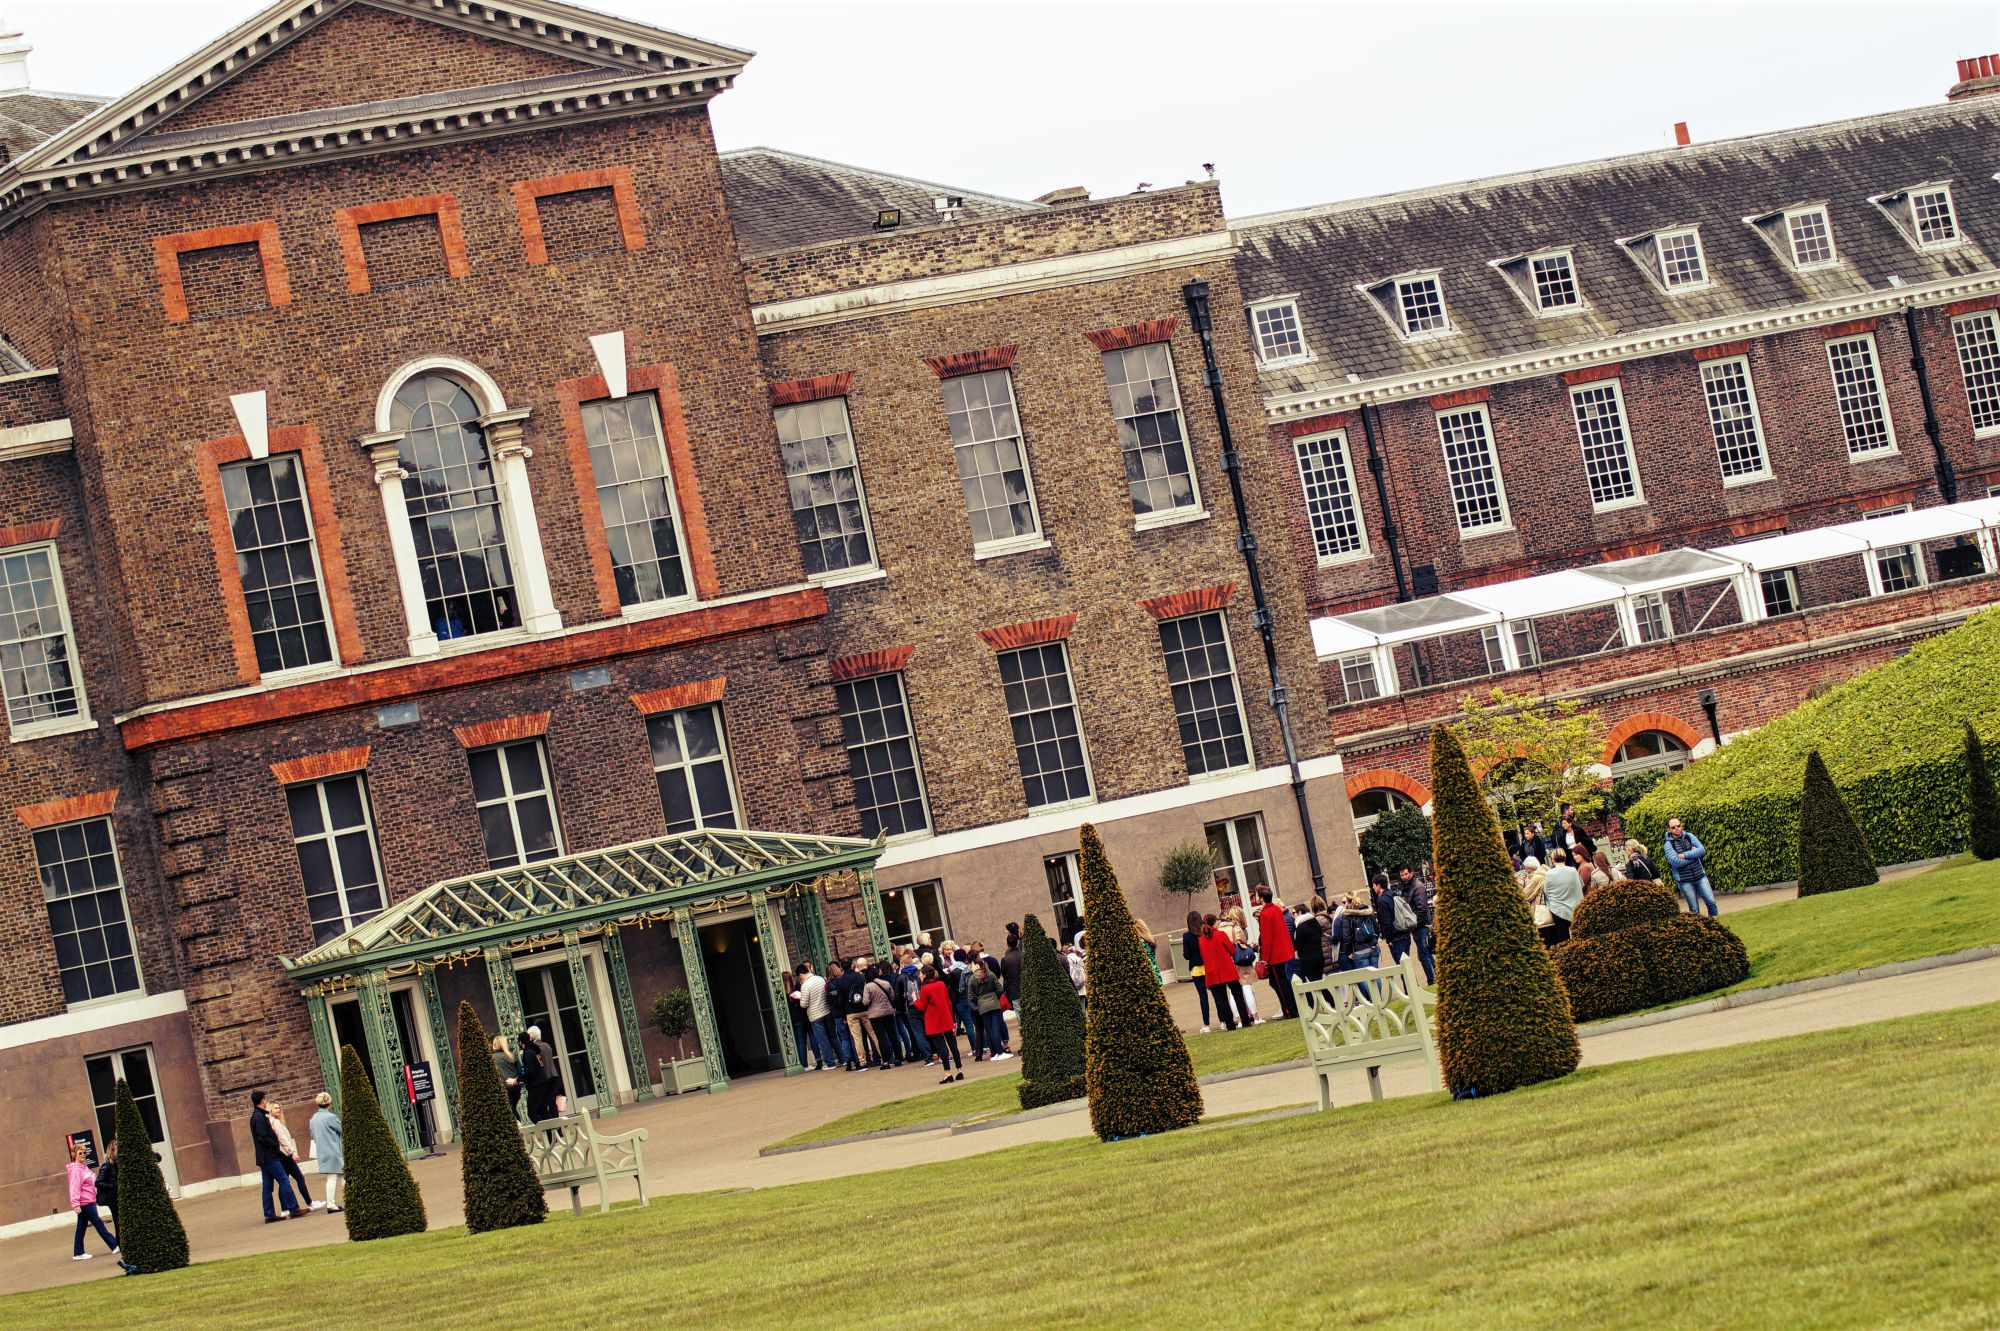 London Kensington Palace Hotel